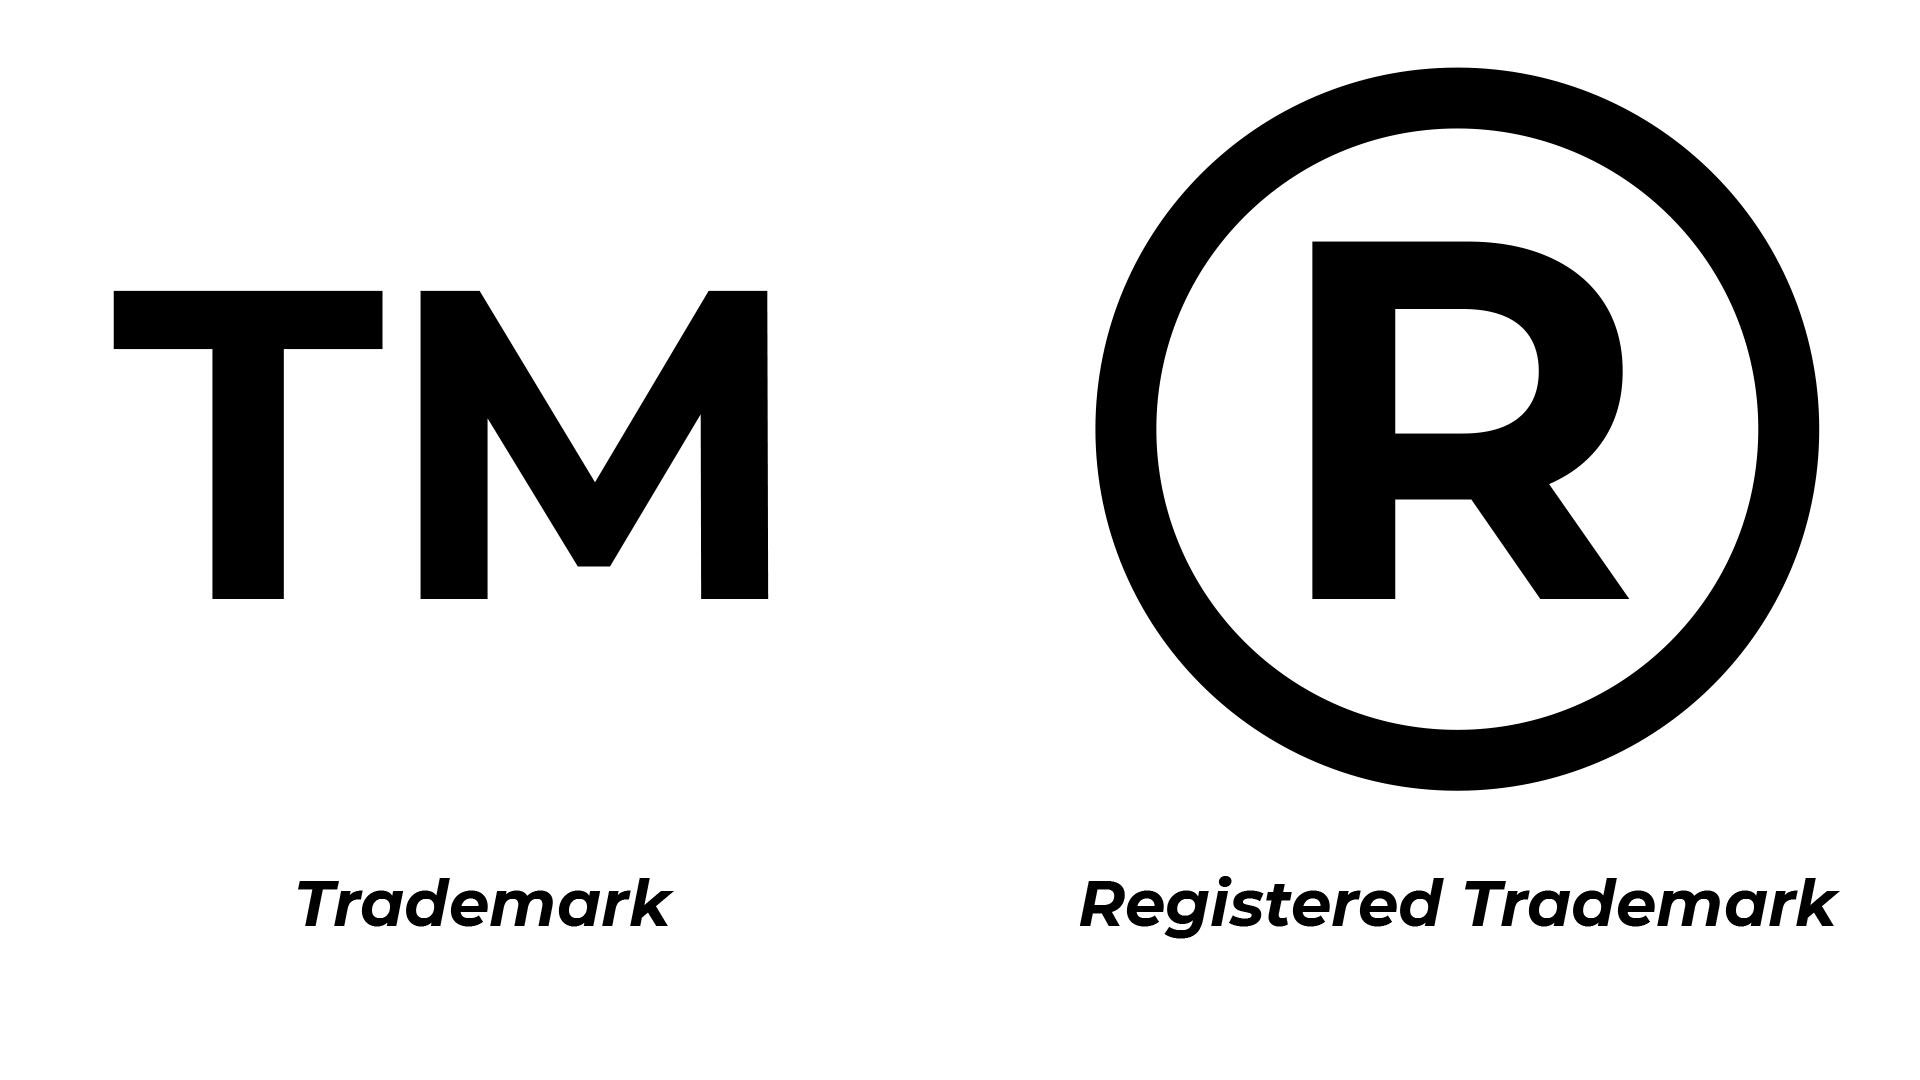 Trademark Symbol Trademark Symbol Company Symbol Trademark